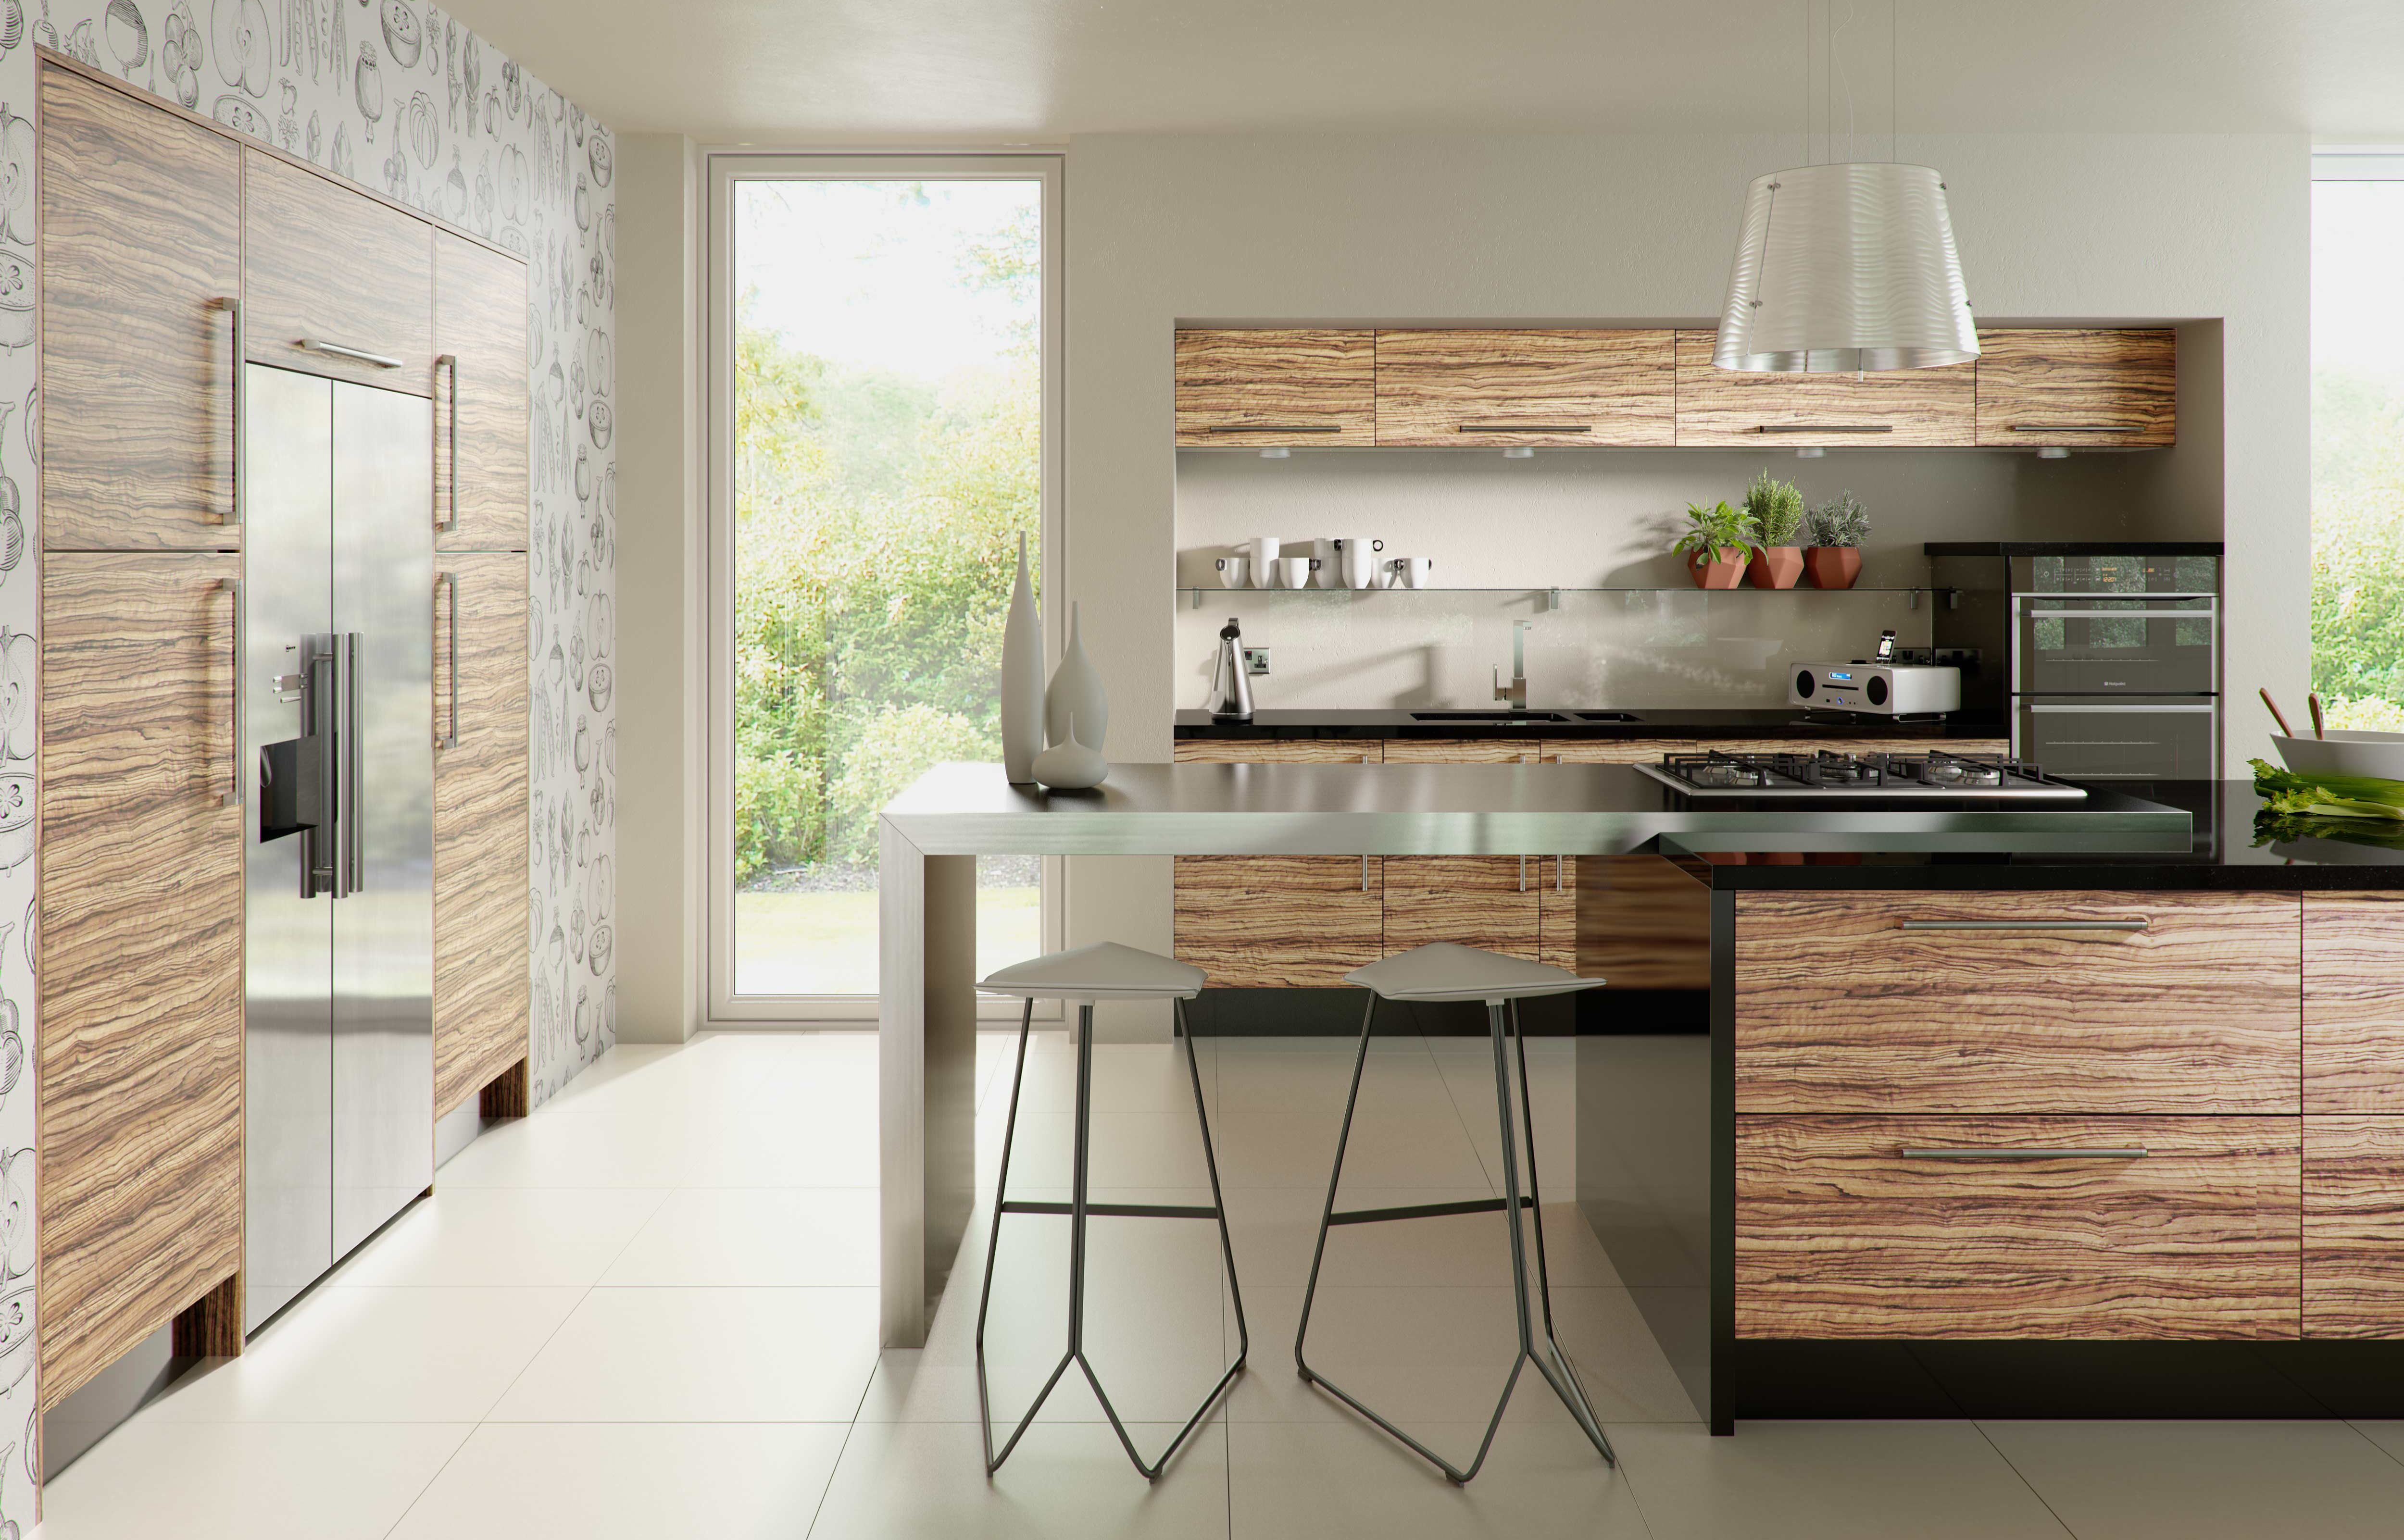 Caribbean Walnut range | DM Design Kitchens | Pinterest